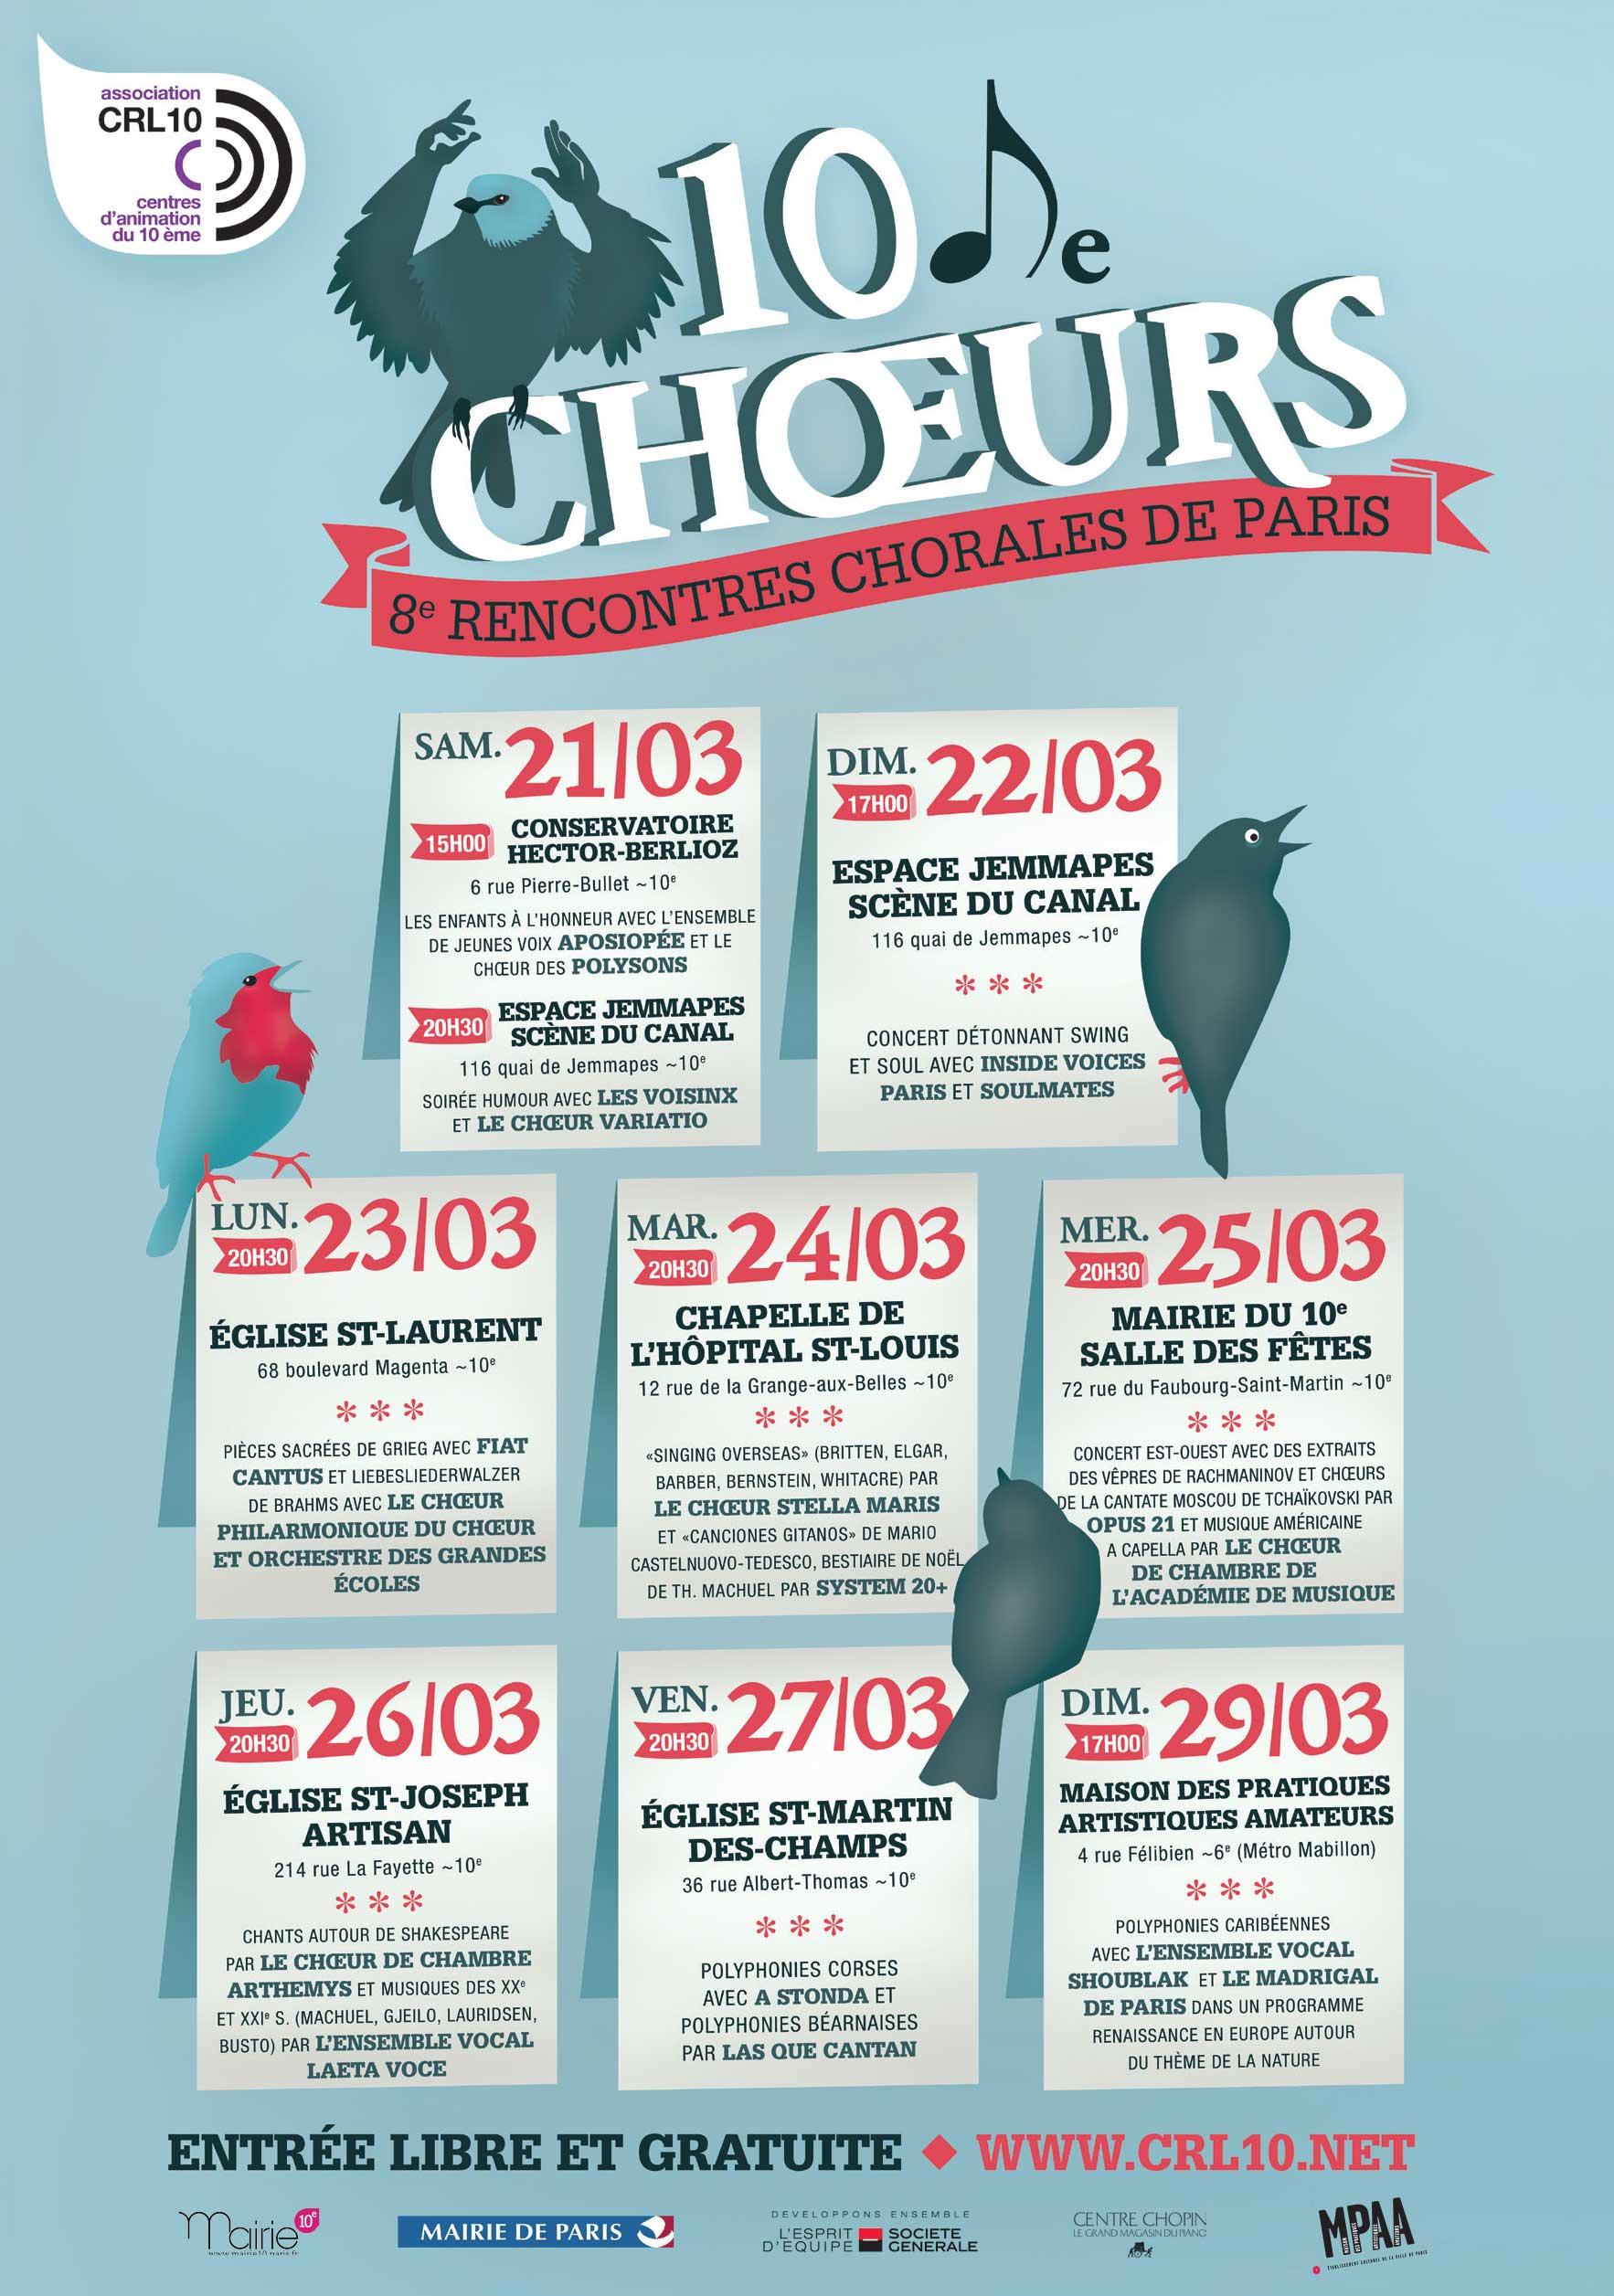 affiche10dechoeurs2015formatweb